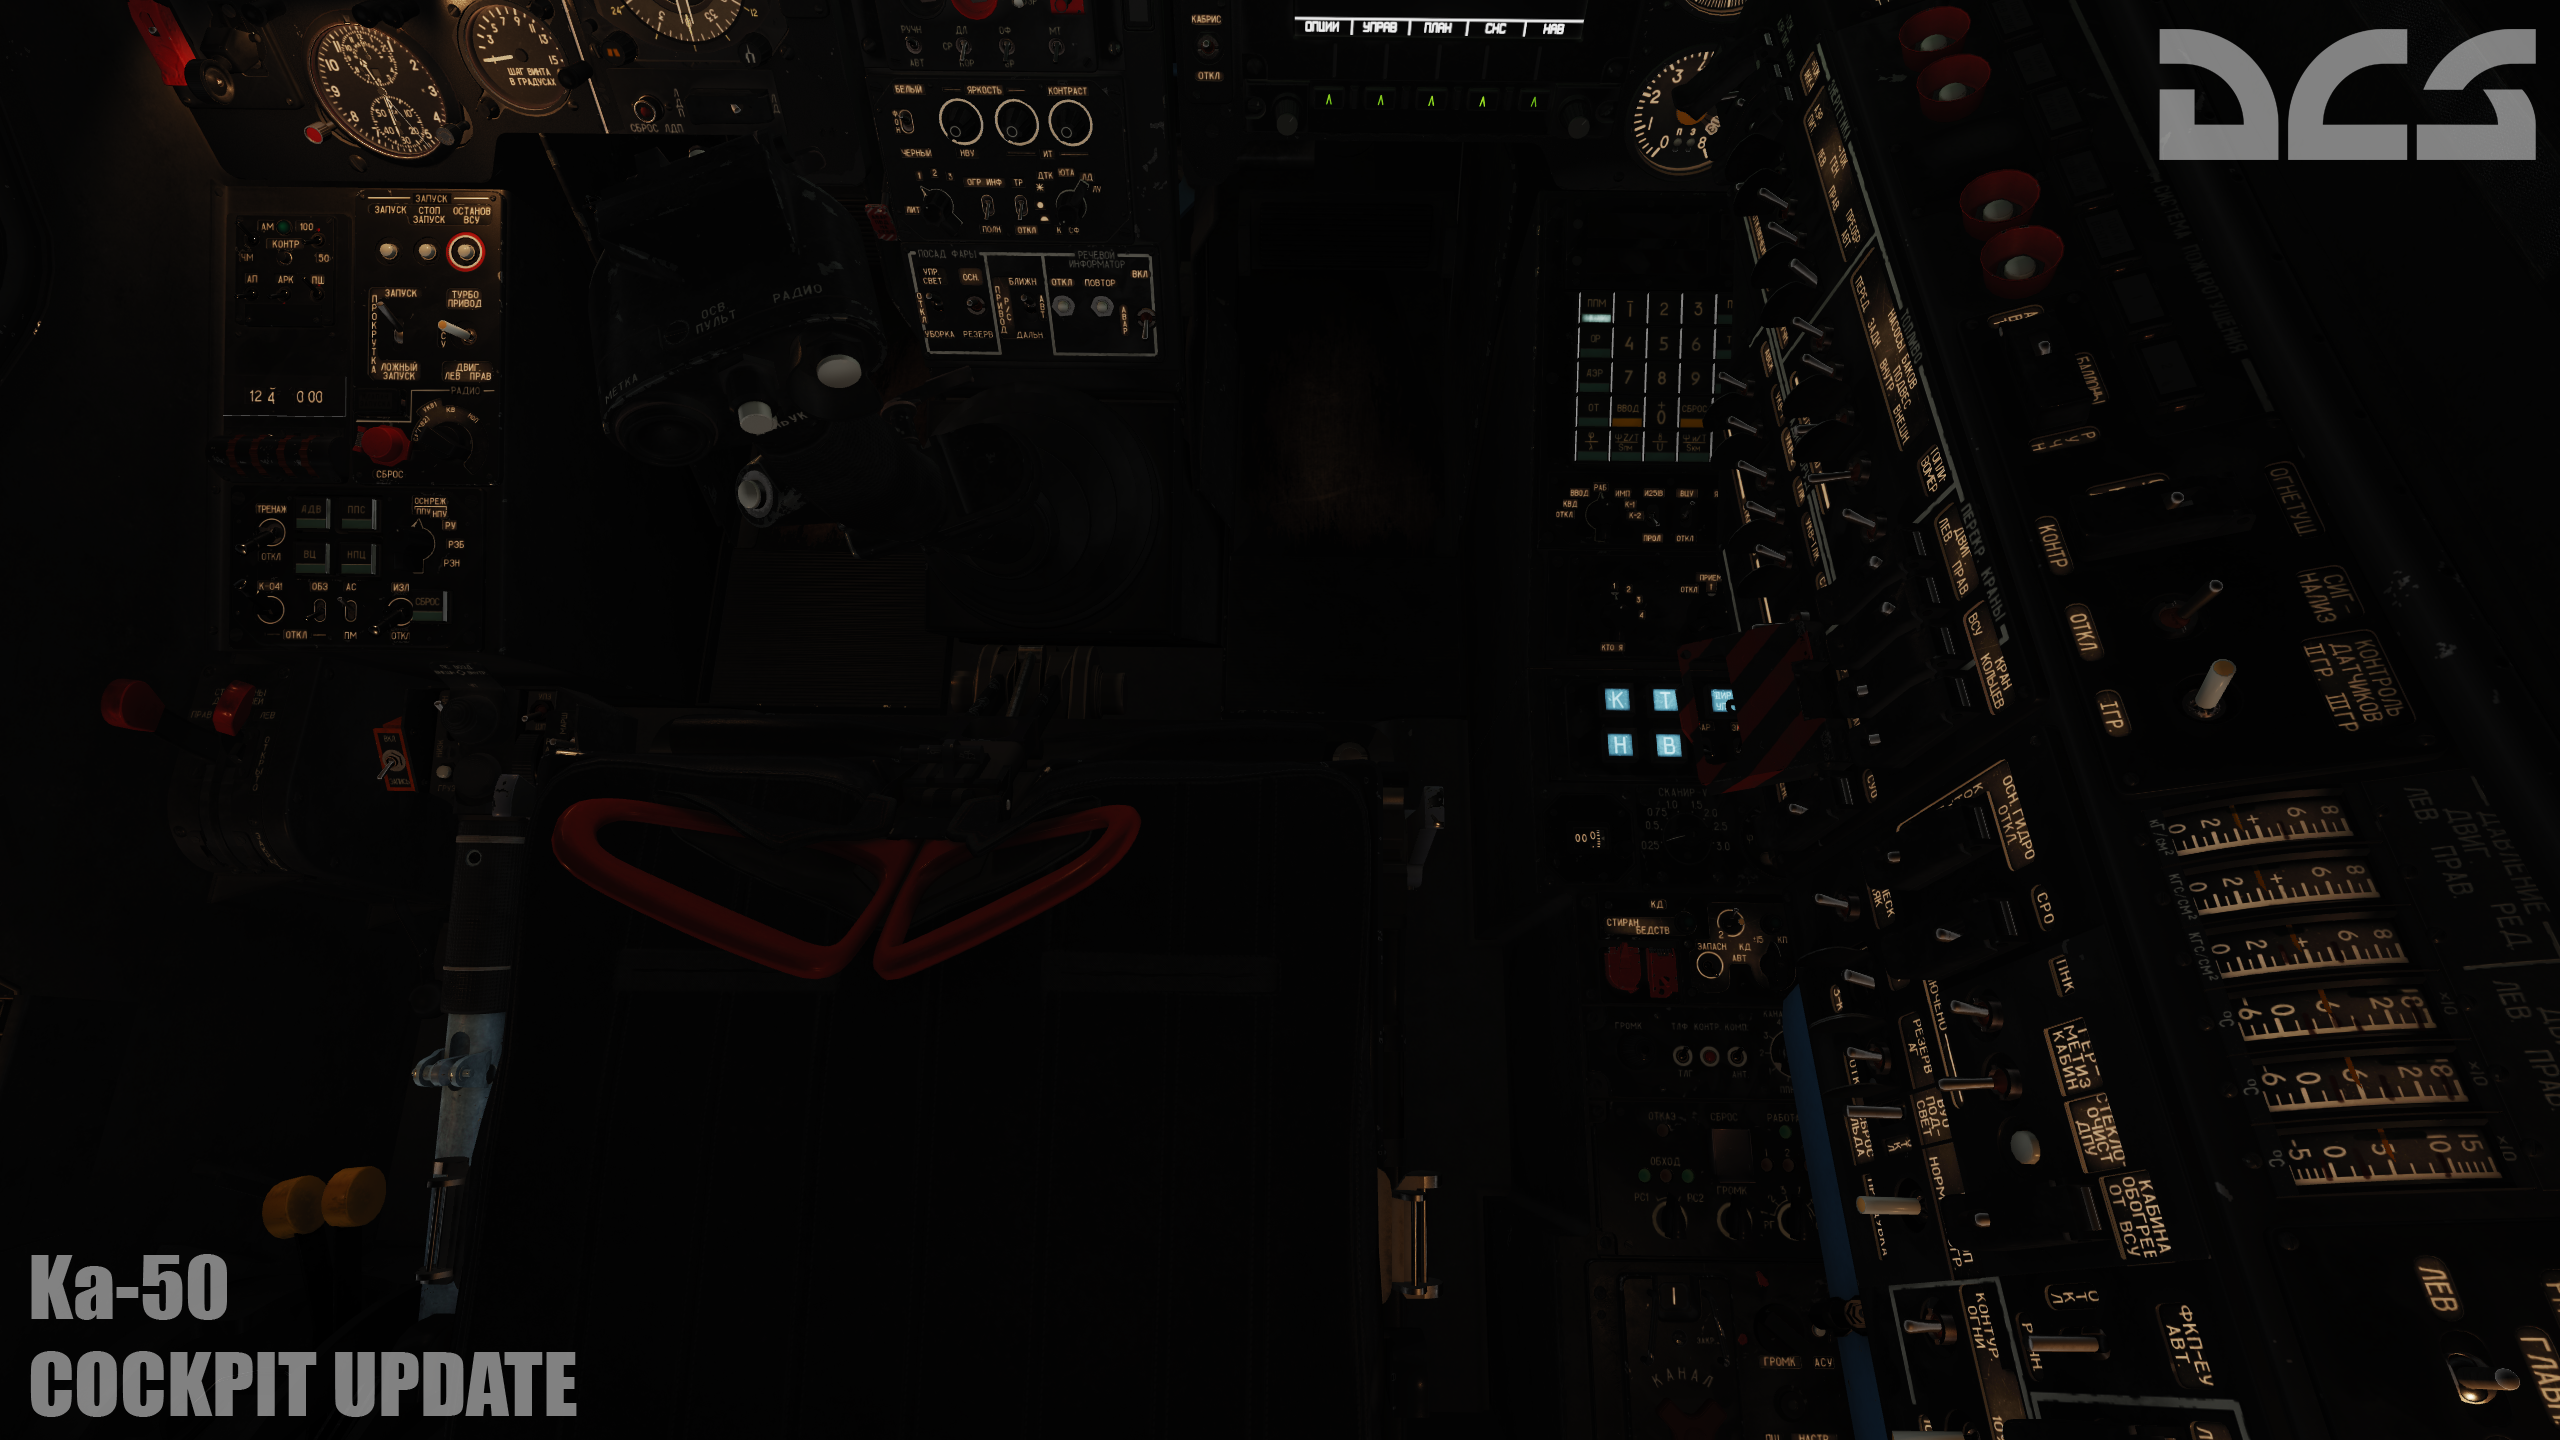 www.digitalcombatsimulator.com/upload/iblock/320/Screenshot-Ka-50_2.png